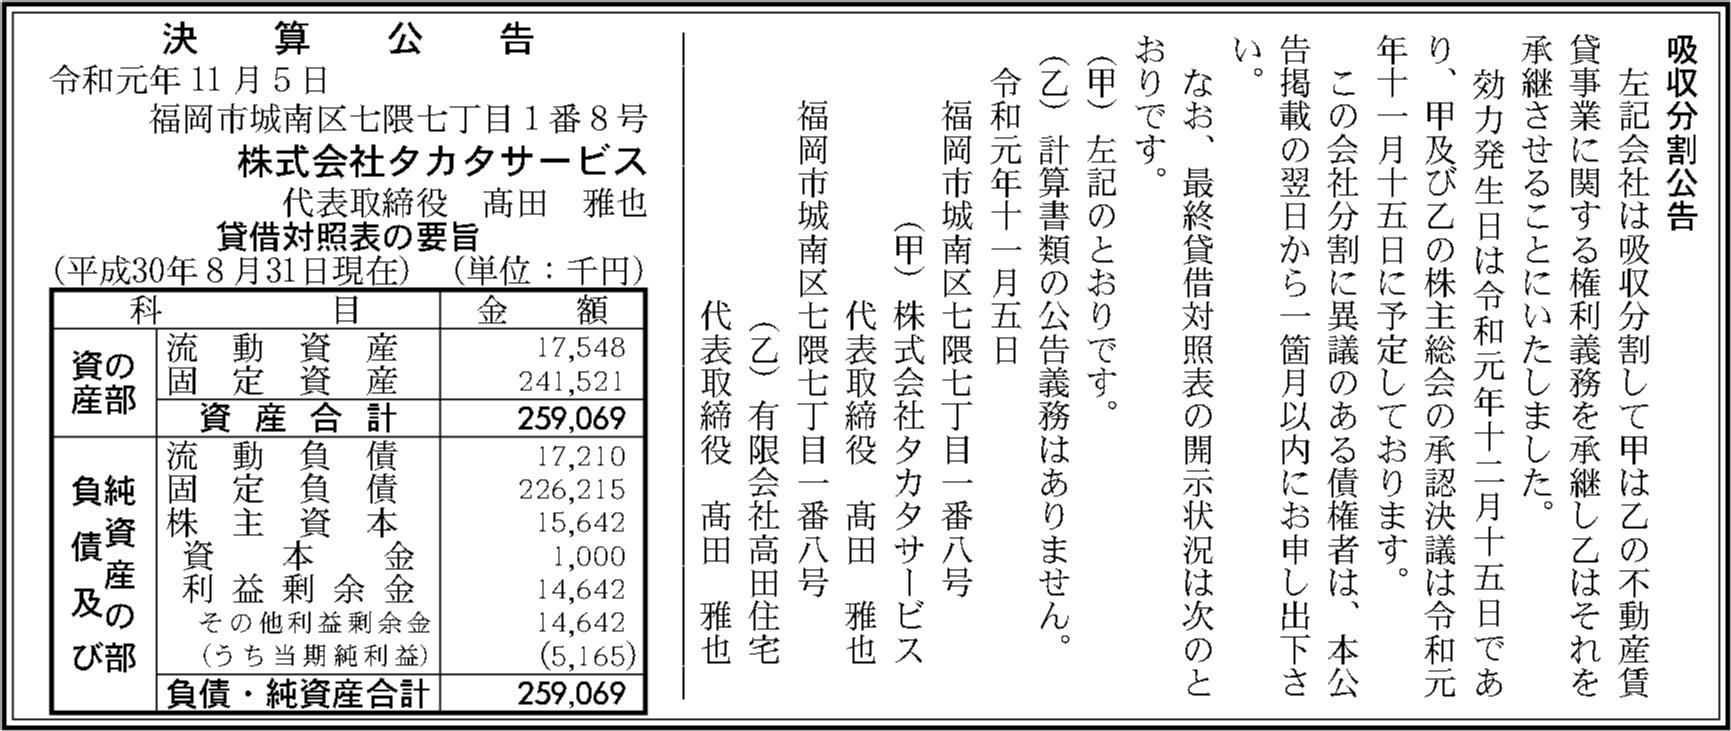 0093 8ada2cd4f4f448feb8356a4e64f9103e8644d8520cbfa72924109261538fd5f89558bdf19bc16e0b768b585419bda3c268f5cf28607fb2cf8cc4f60a98514b9b 04